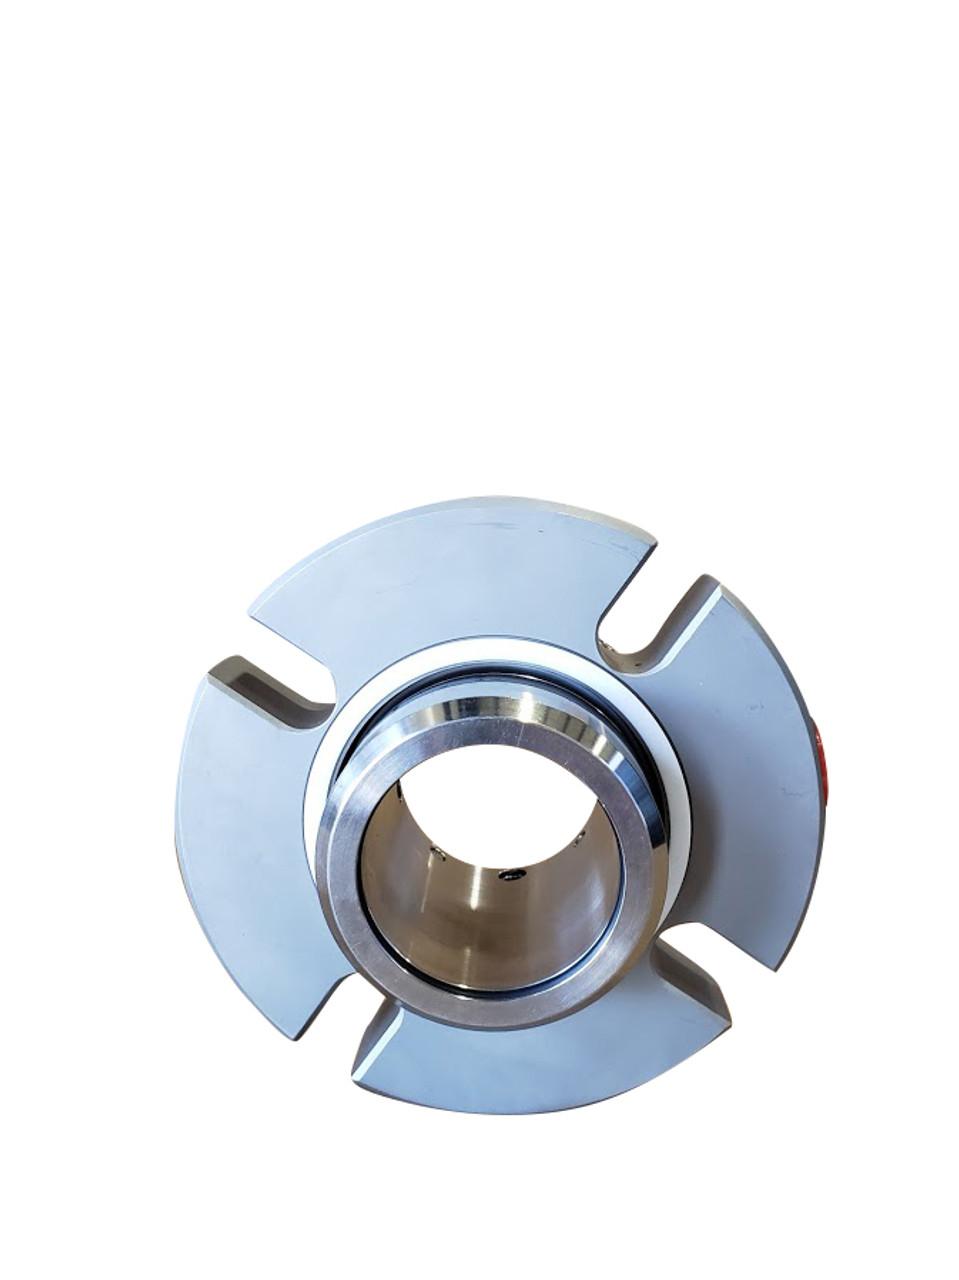 "1.875"", Mechanical Seal, Multiple Spring Cartridge, Silicon Carbide, STD. Bore"